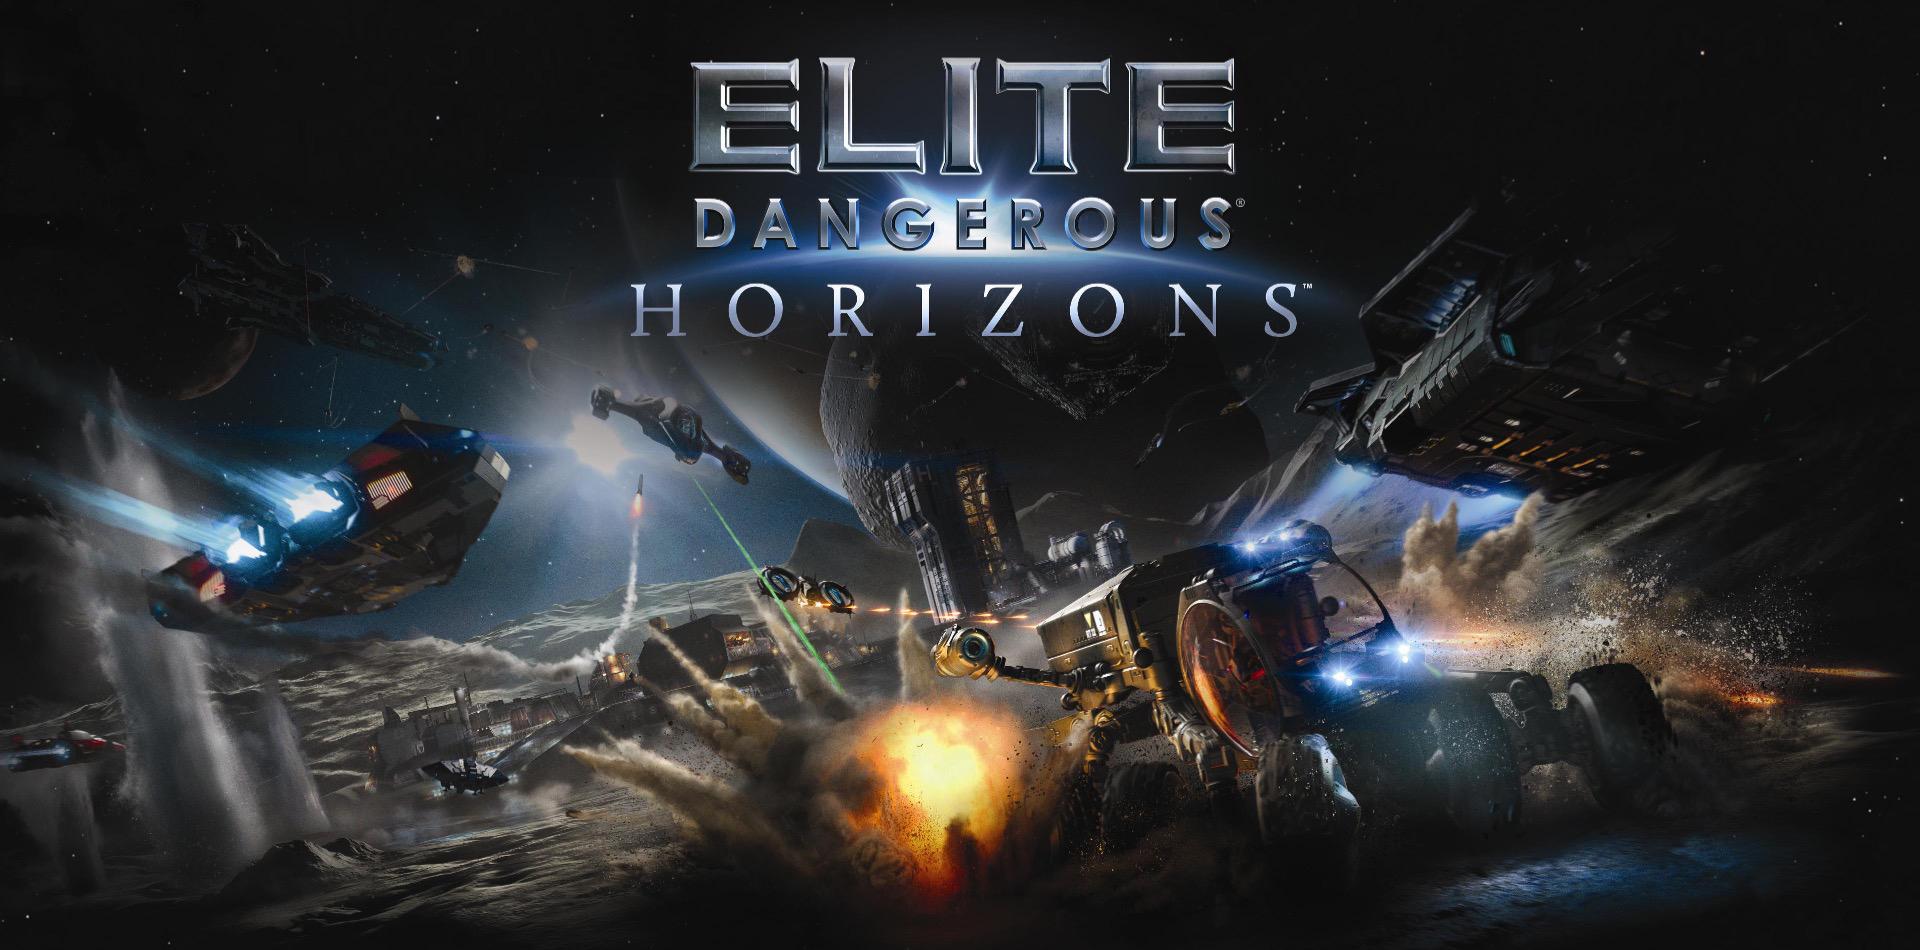 A partir del mes de octubre la expansión Horizons de Elite Dangerous será gratuita